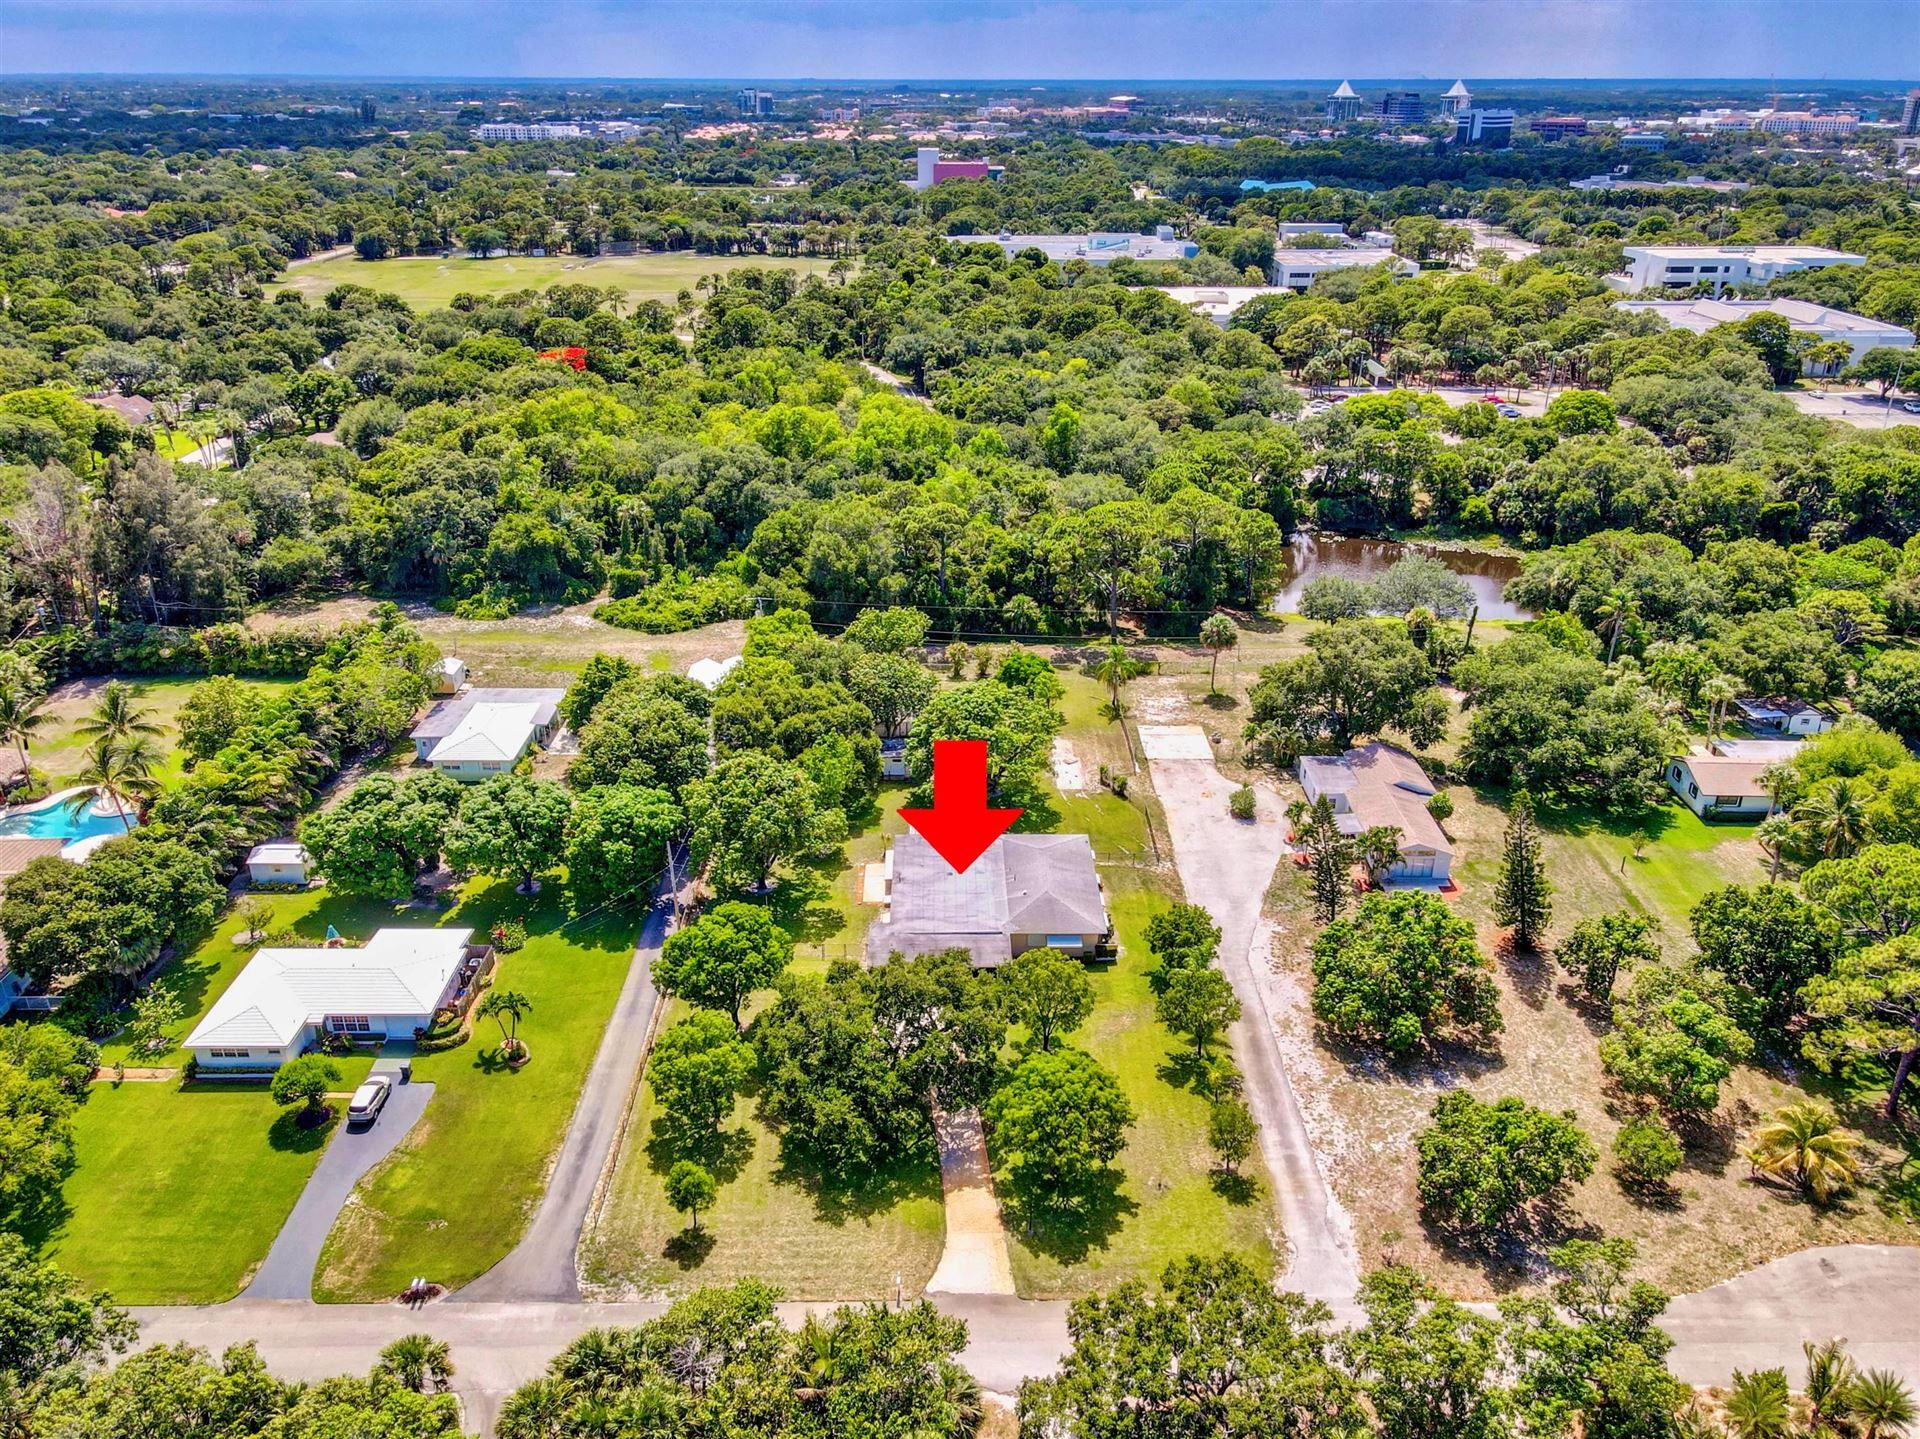 11183 Monet Lane, Palm Beach Gardens, FL 33410 - MLS#: RX-10708051